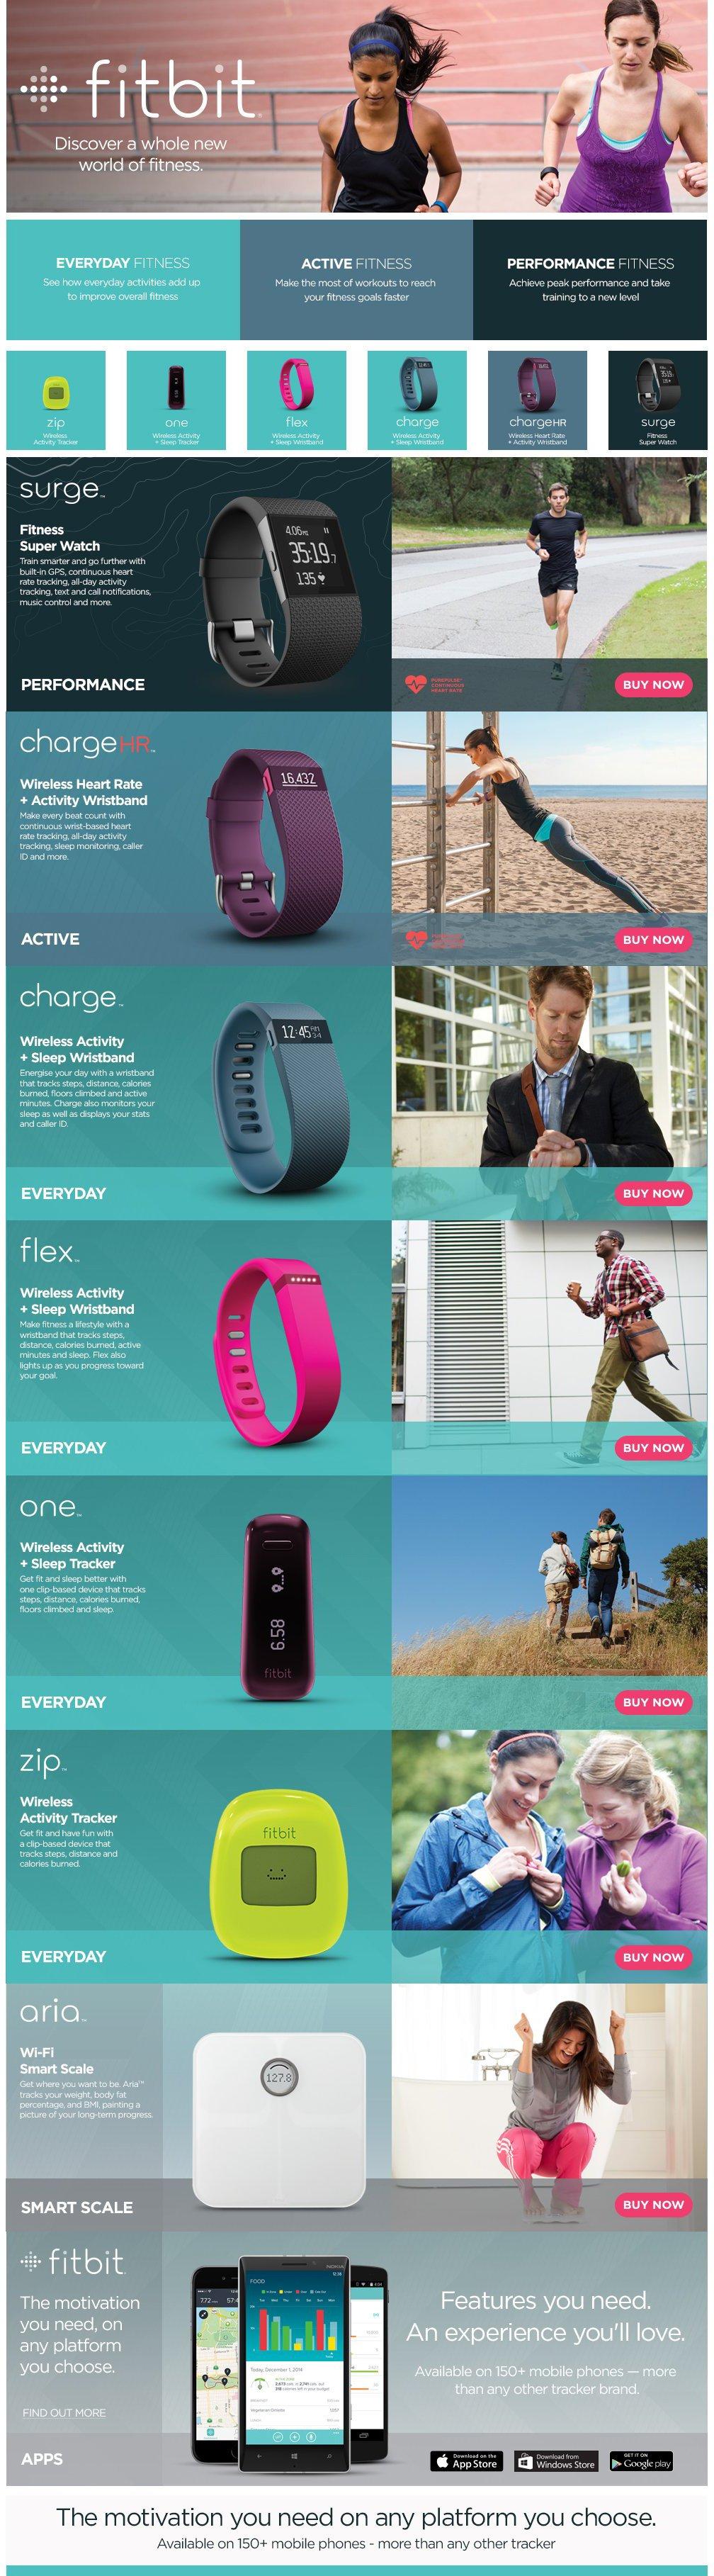 Fitbit_Brand_Store_Sports